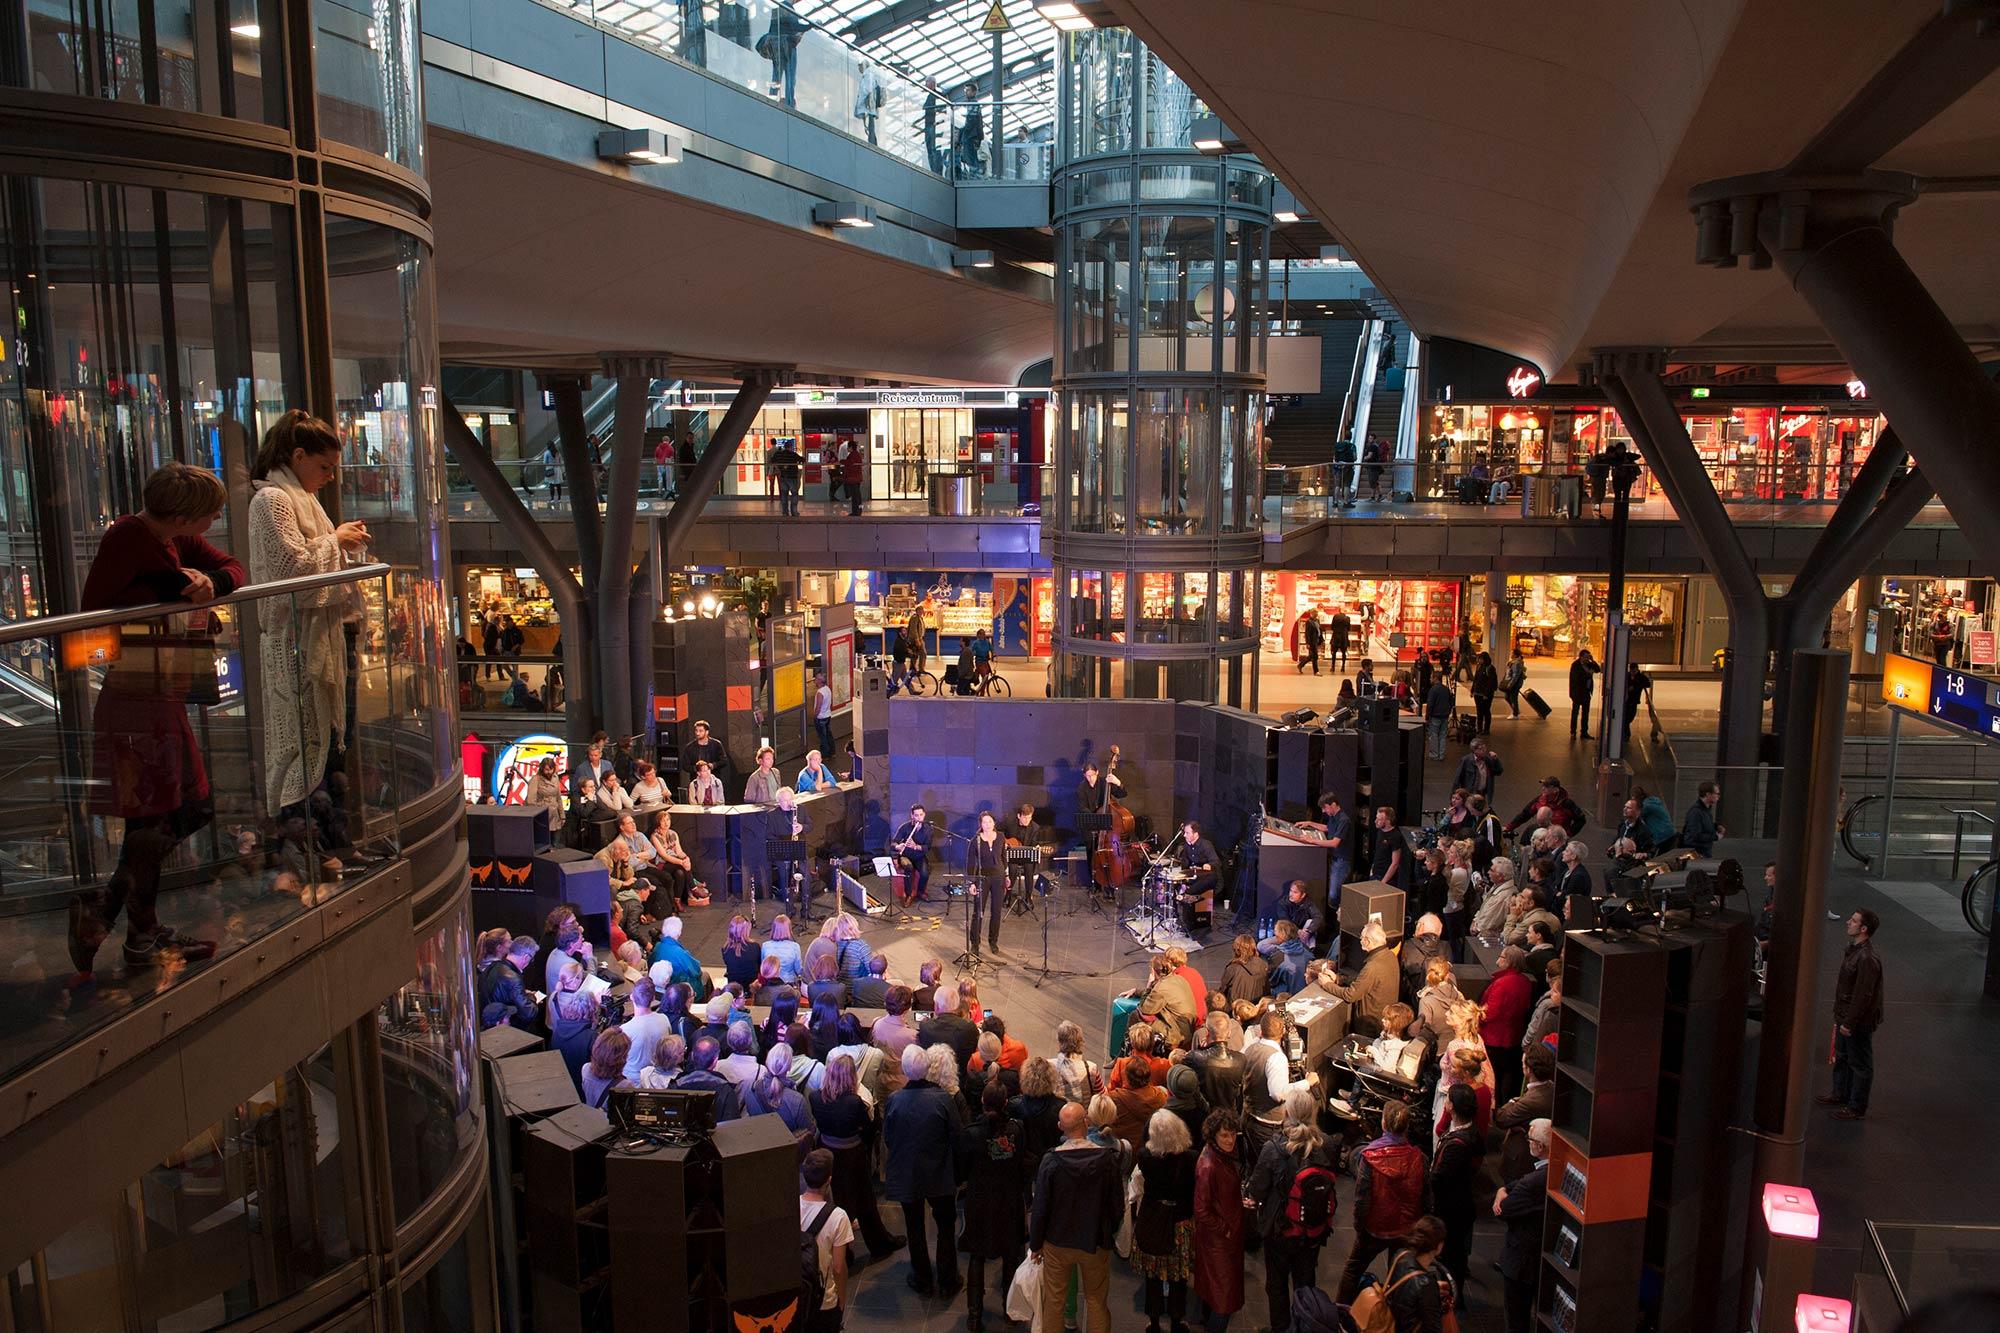 Festivaleröffning im Berliner Hauptbahnhof foto by Erik-Jan Ouwerkerk